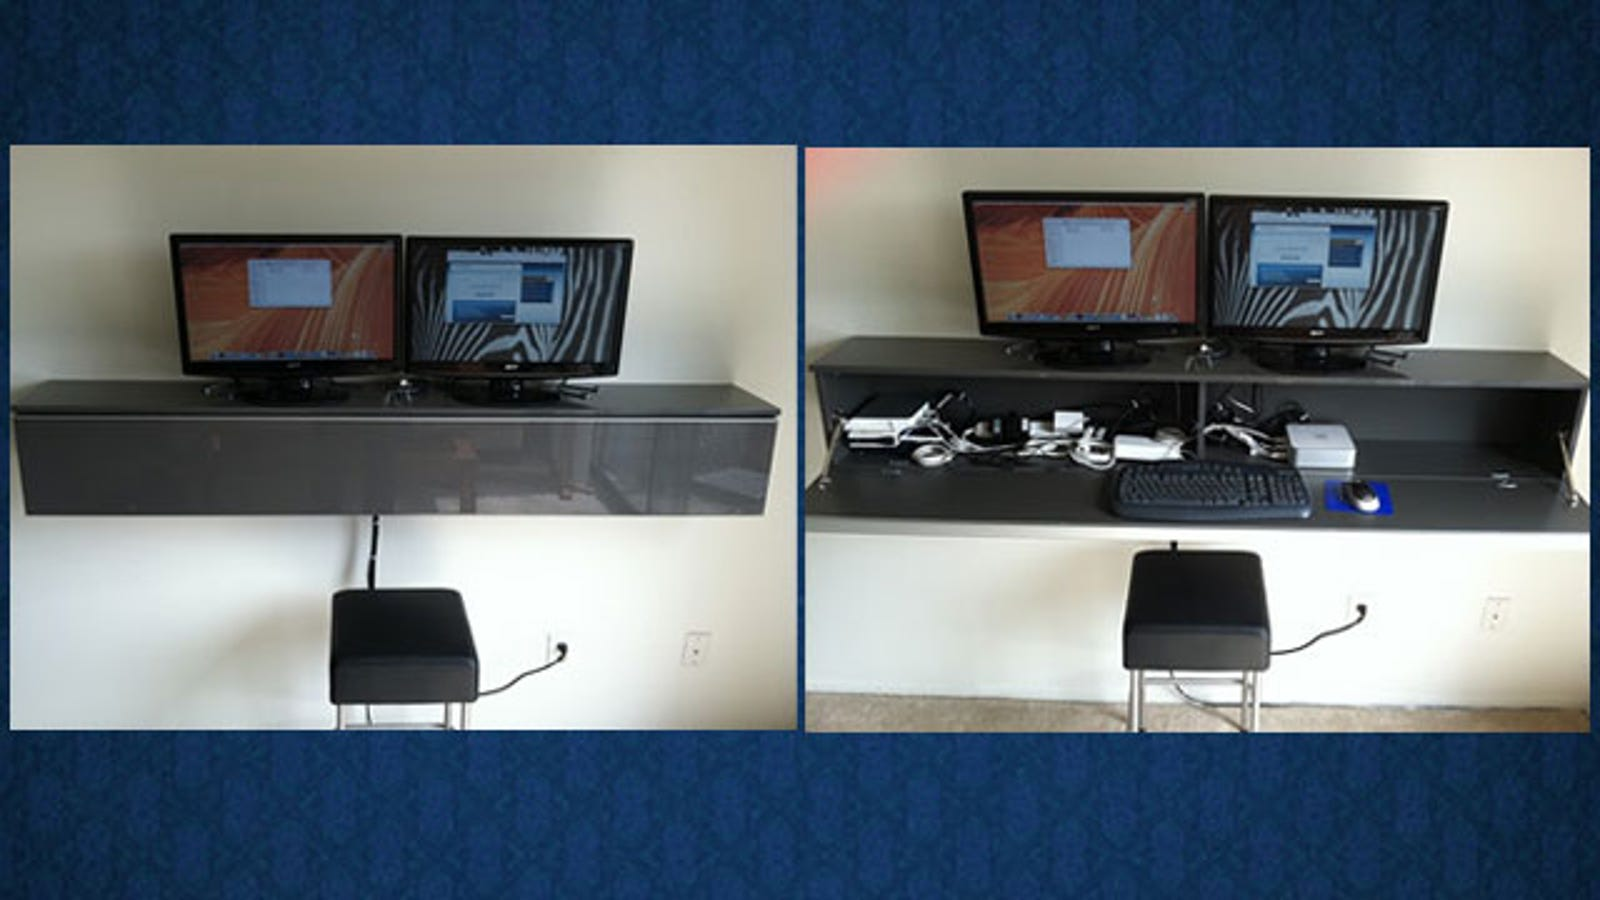 The Suspended Hidden Workspace